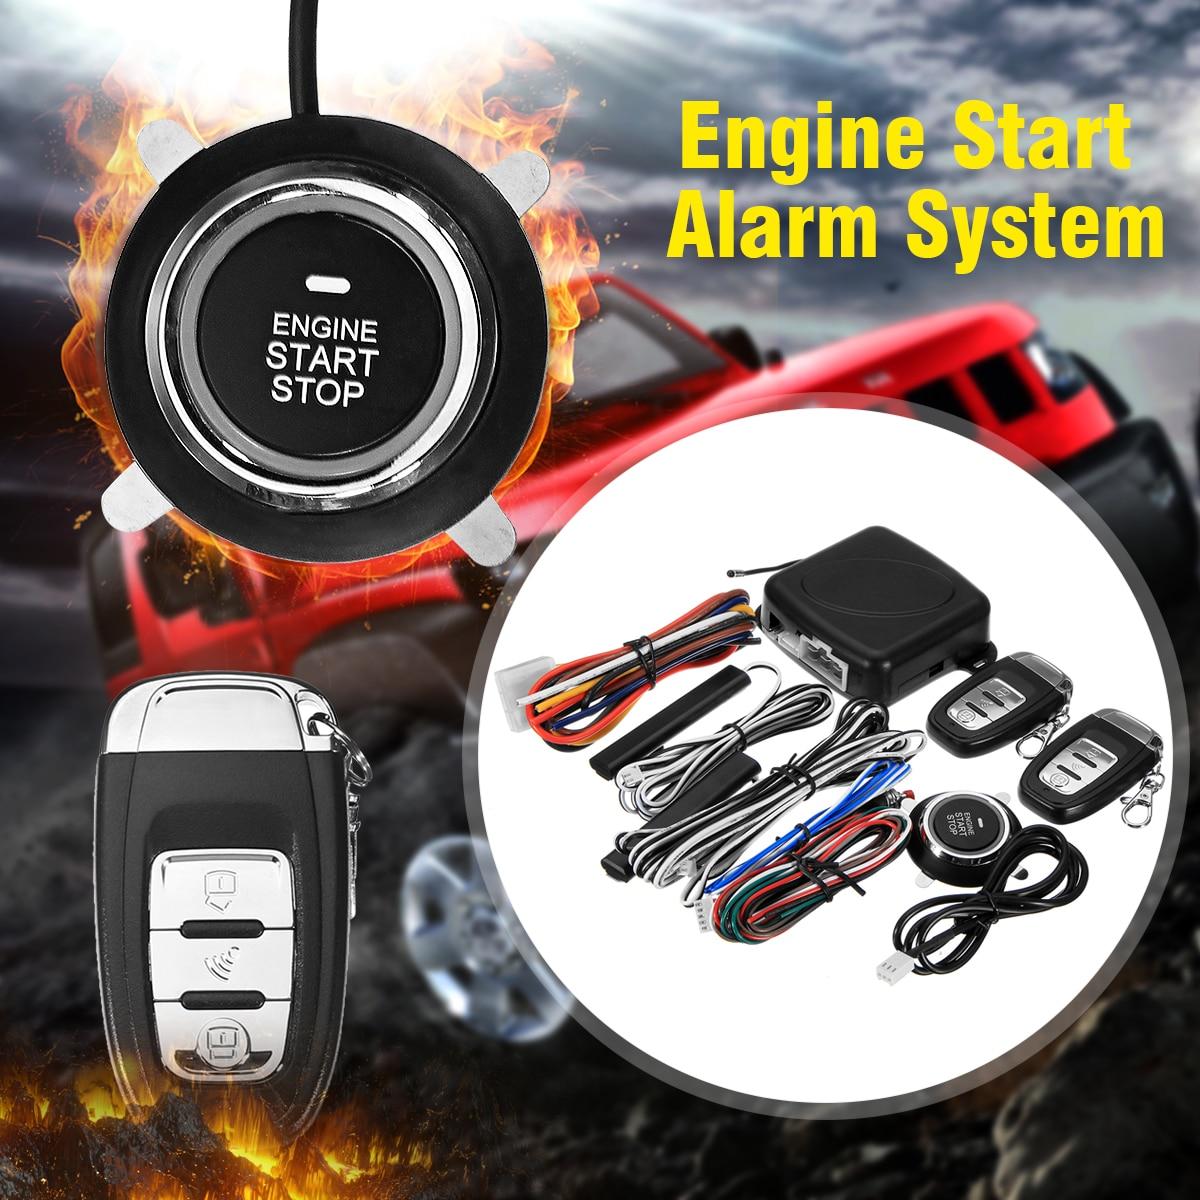 9 PC DIY รถ SUV Keyless เครื่องยนต์ Start Keyless ALARM System รีโมทคอนโทรลปุ่ม Starter หยุดรถยนต์ Auto Car อุปกรณ์เสริม